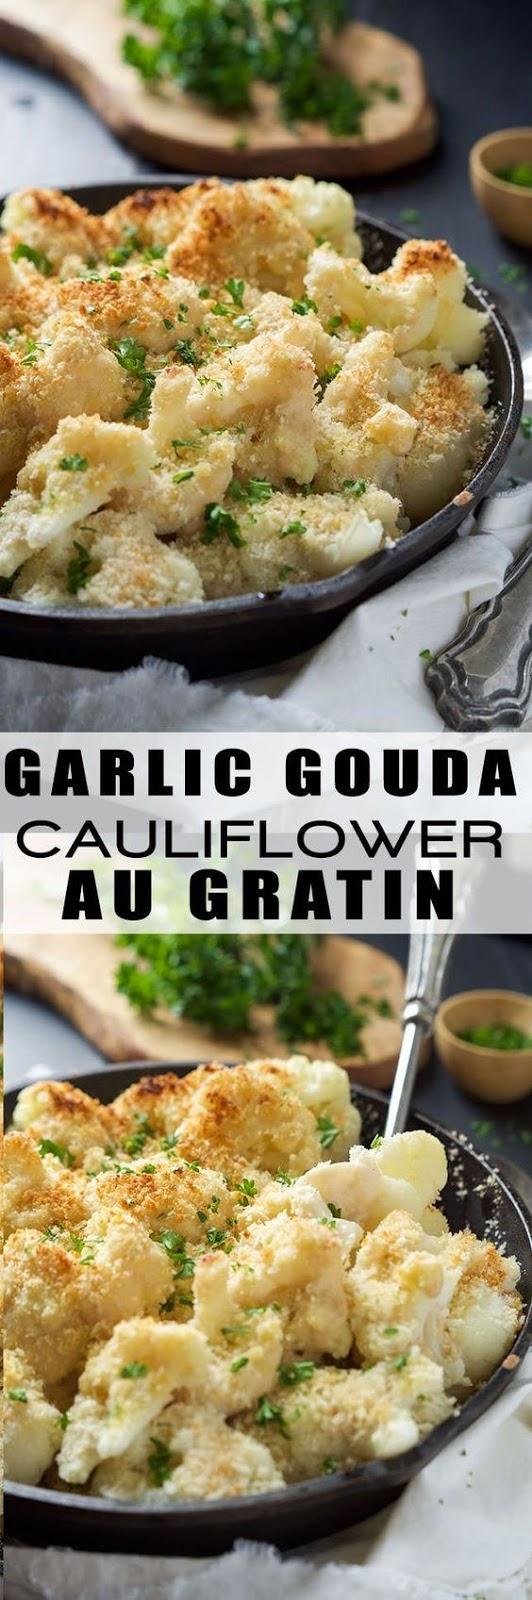 GARLIC GOUDA & PARMESAN CAULIFLOWER AU GRATIN